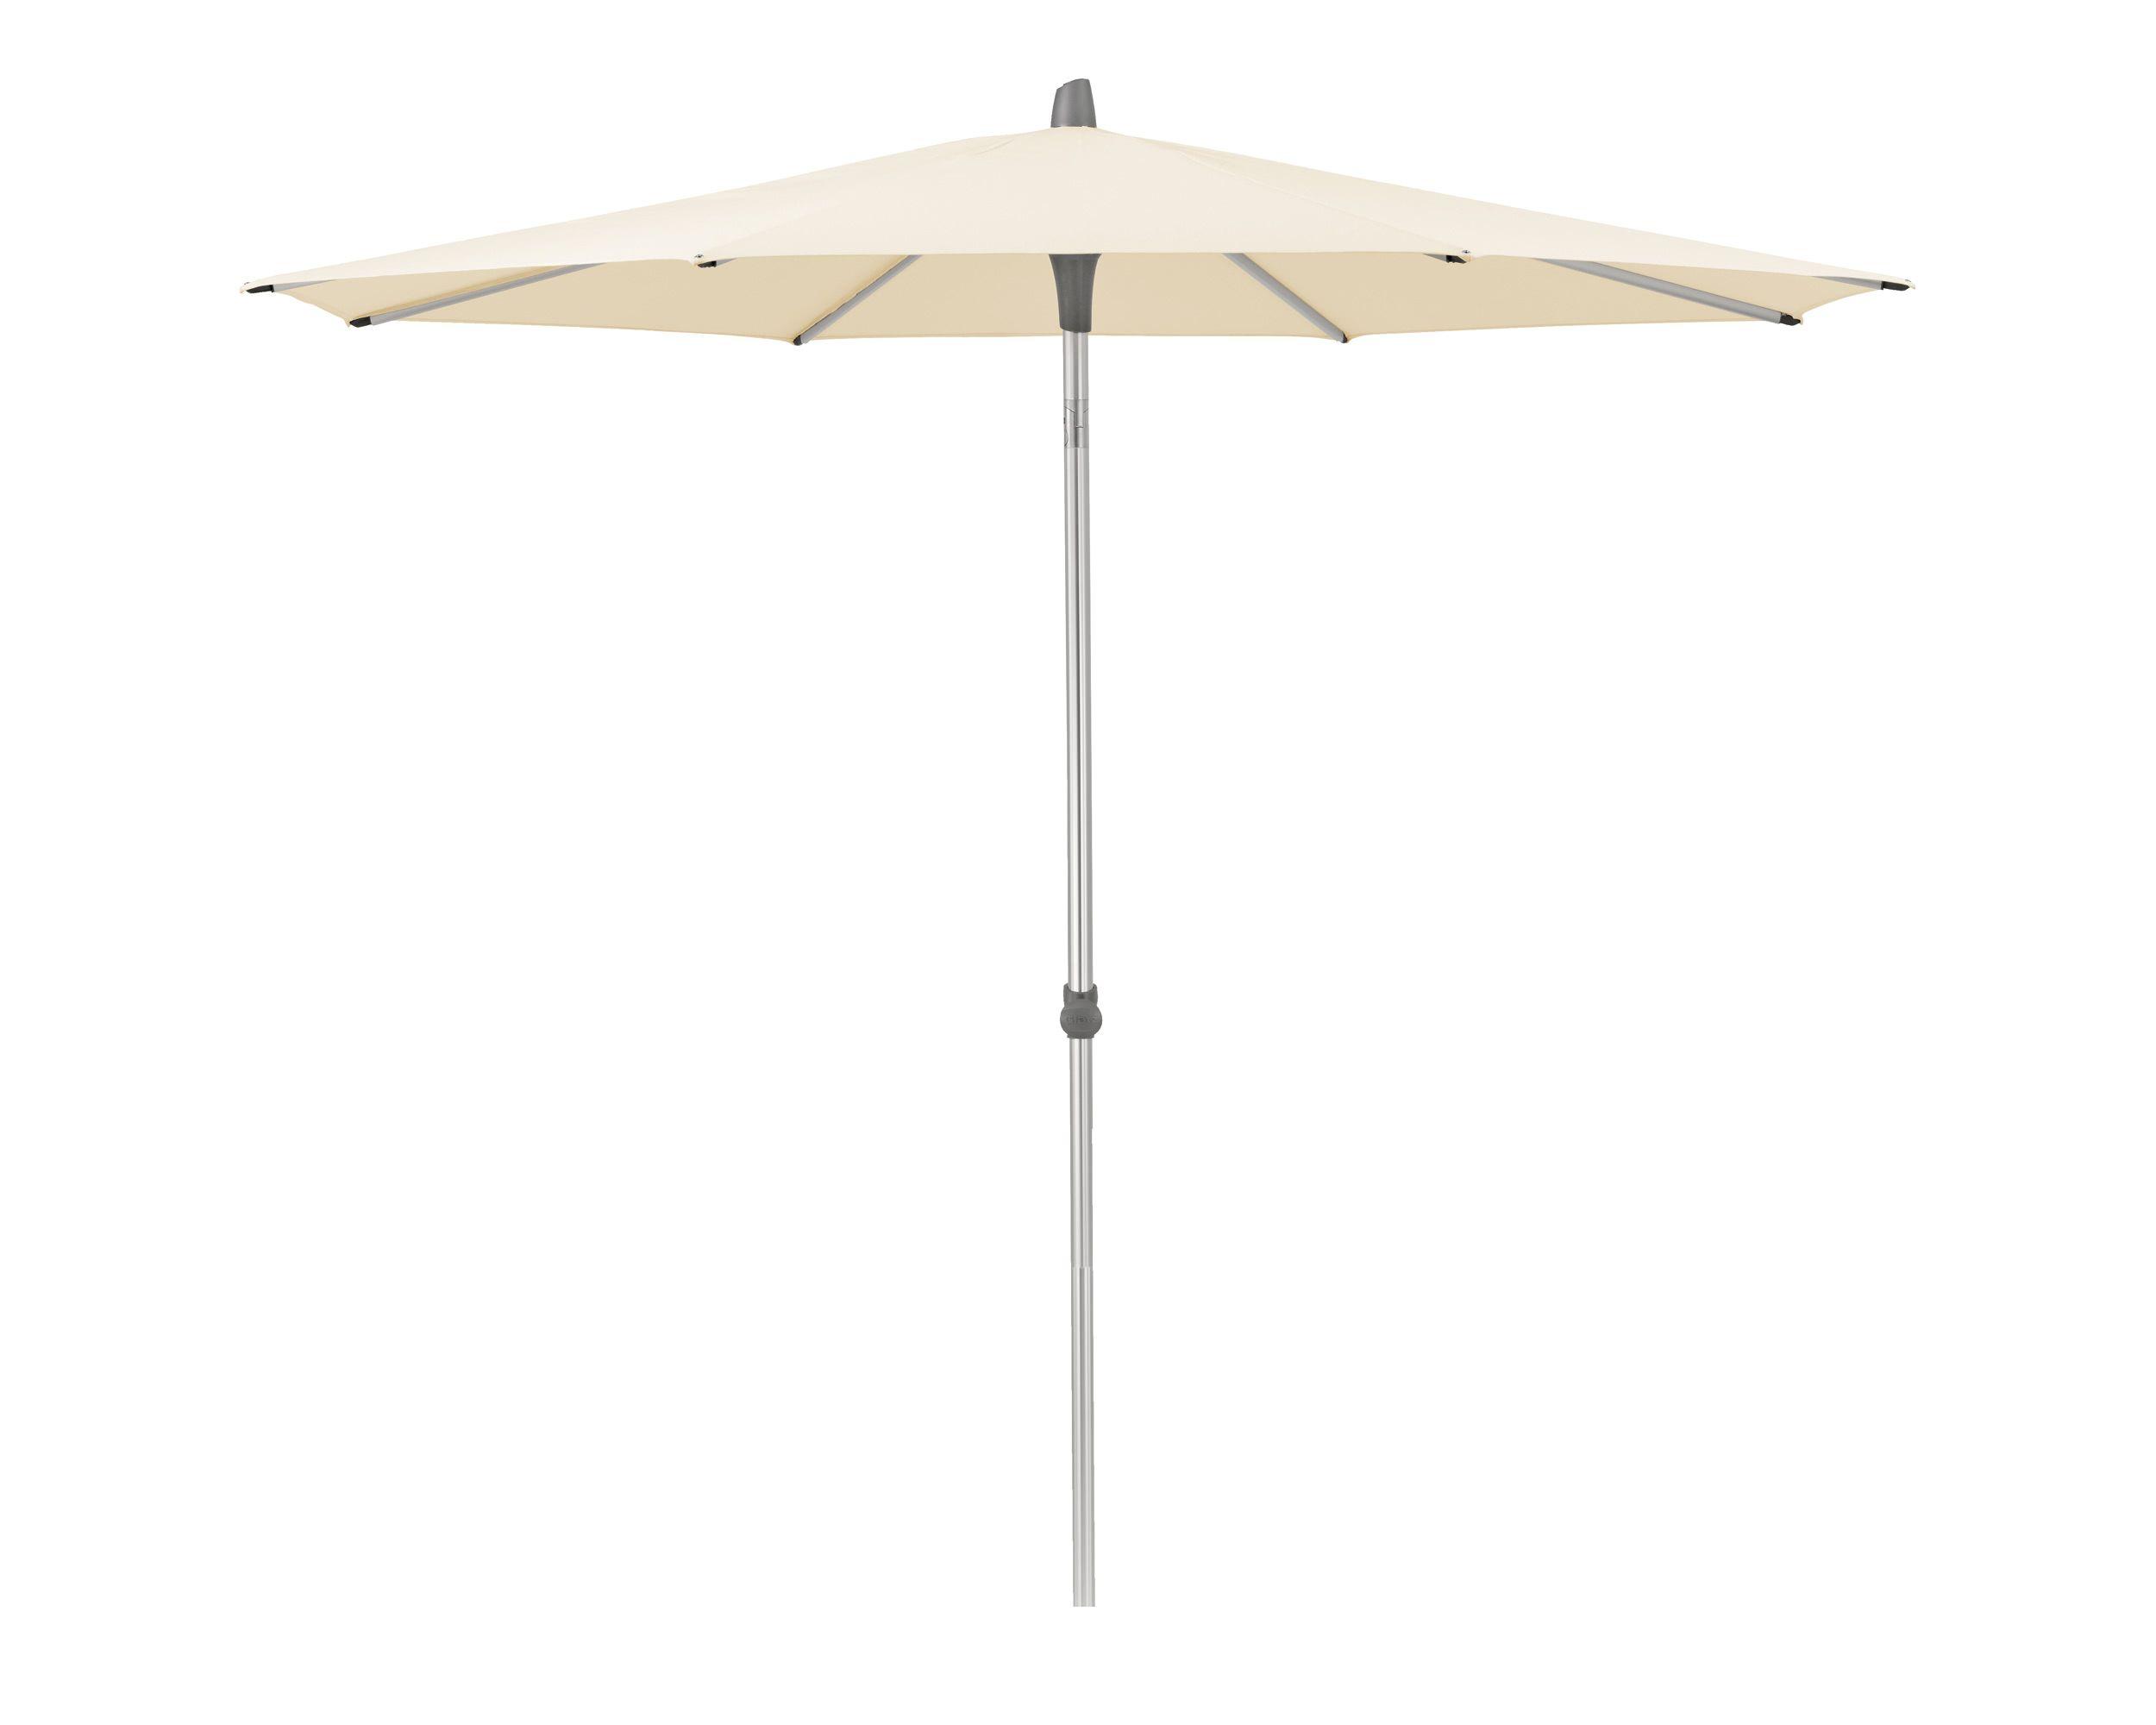 Sonnenschirm Alu-Smart easy, Ø 300 cm